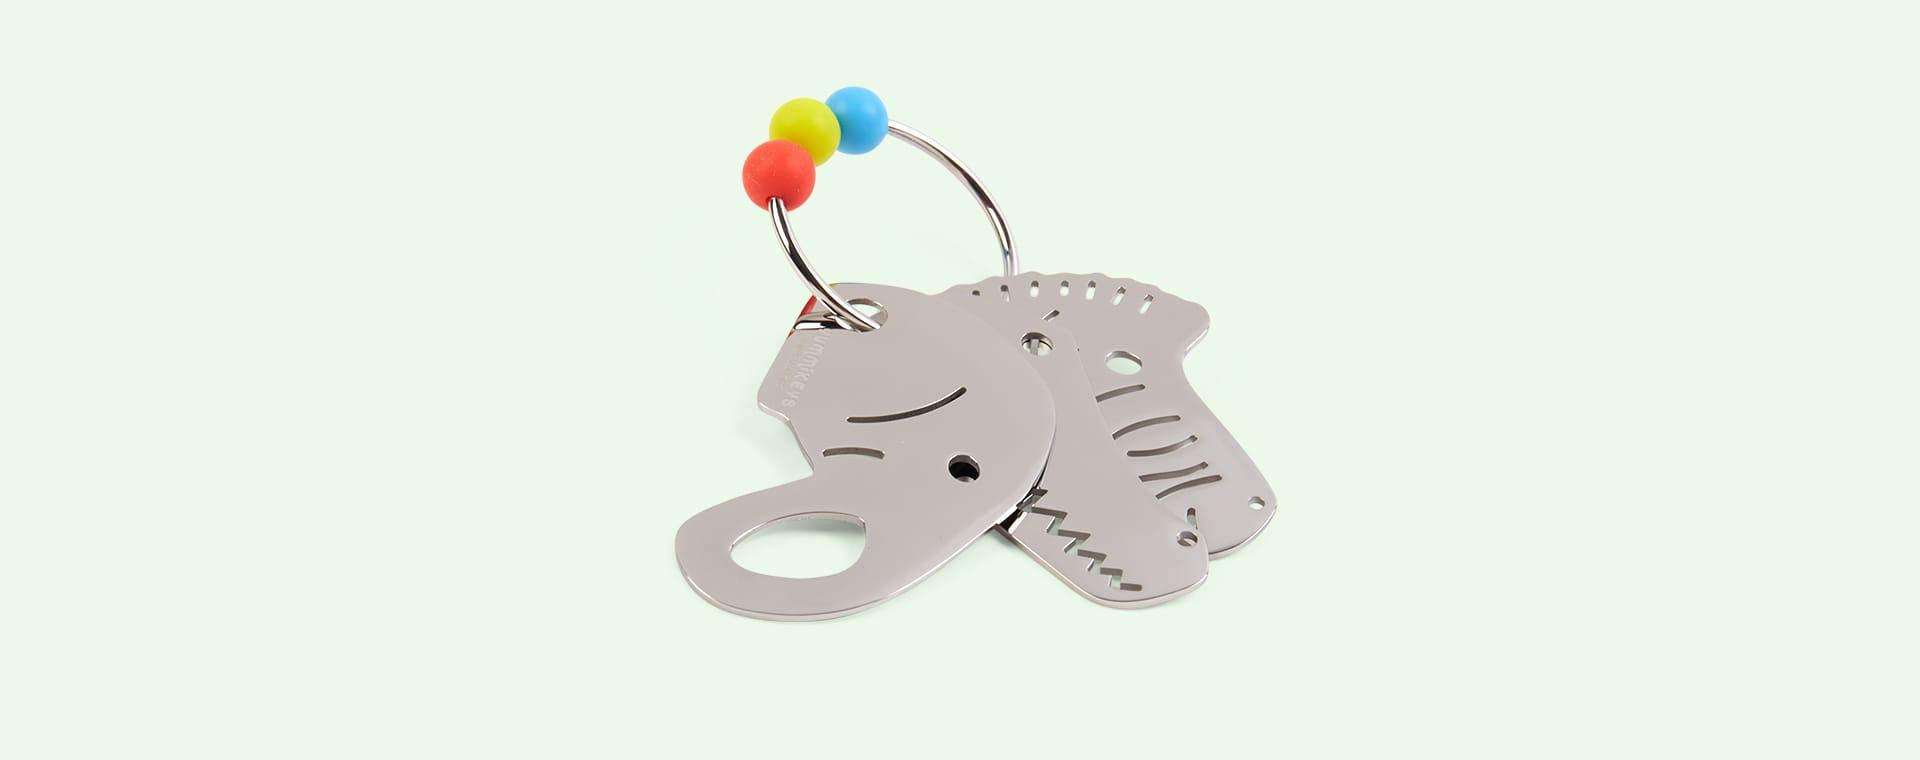 Silver Yummikeys Sensory Toy Keys